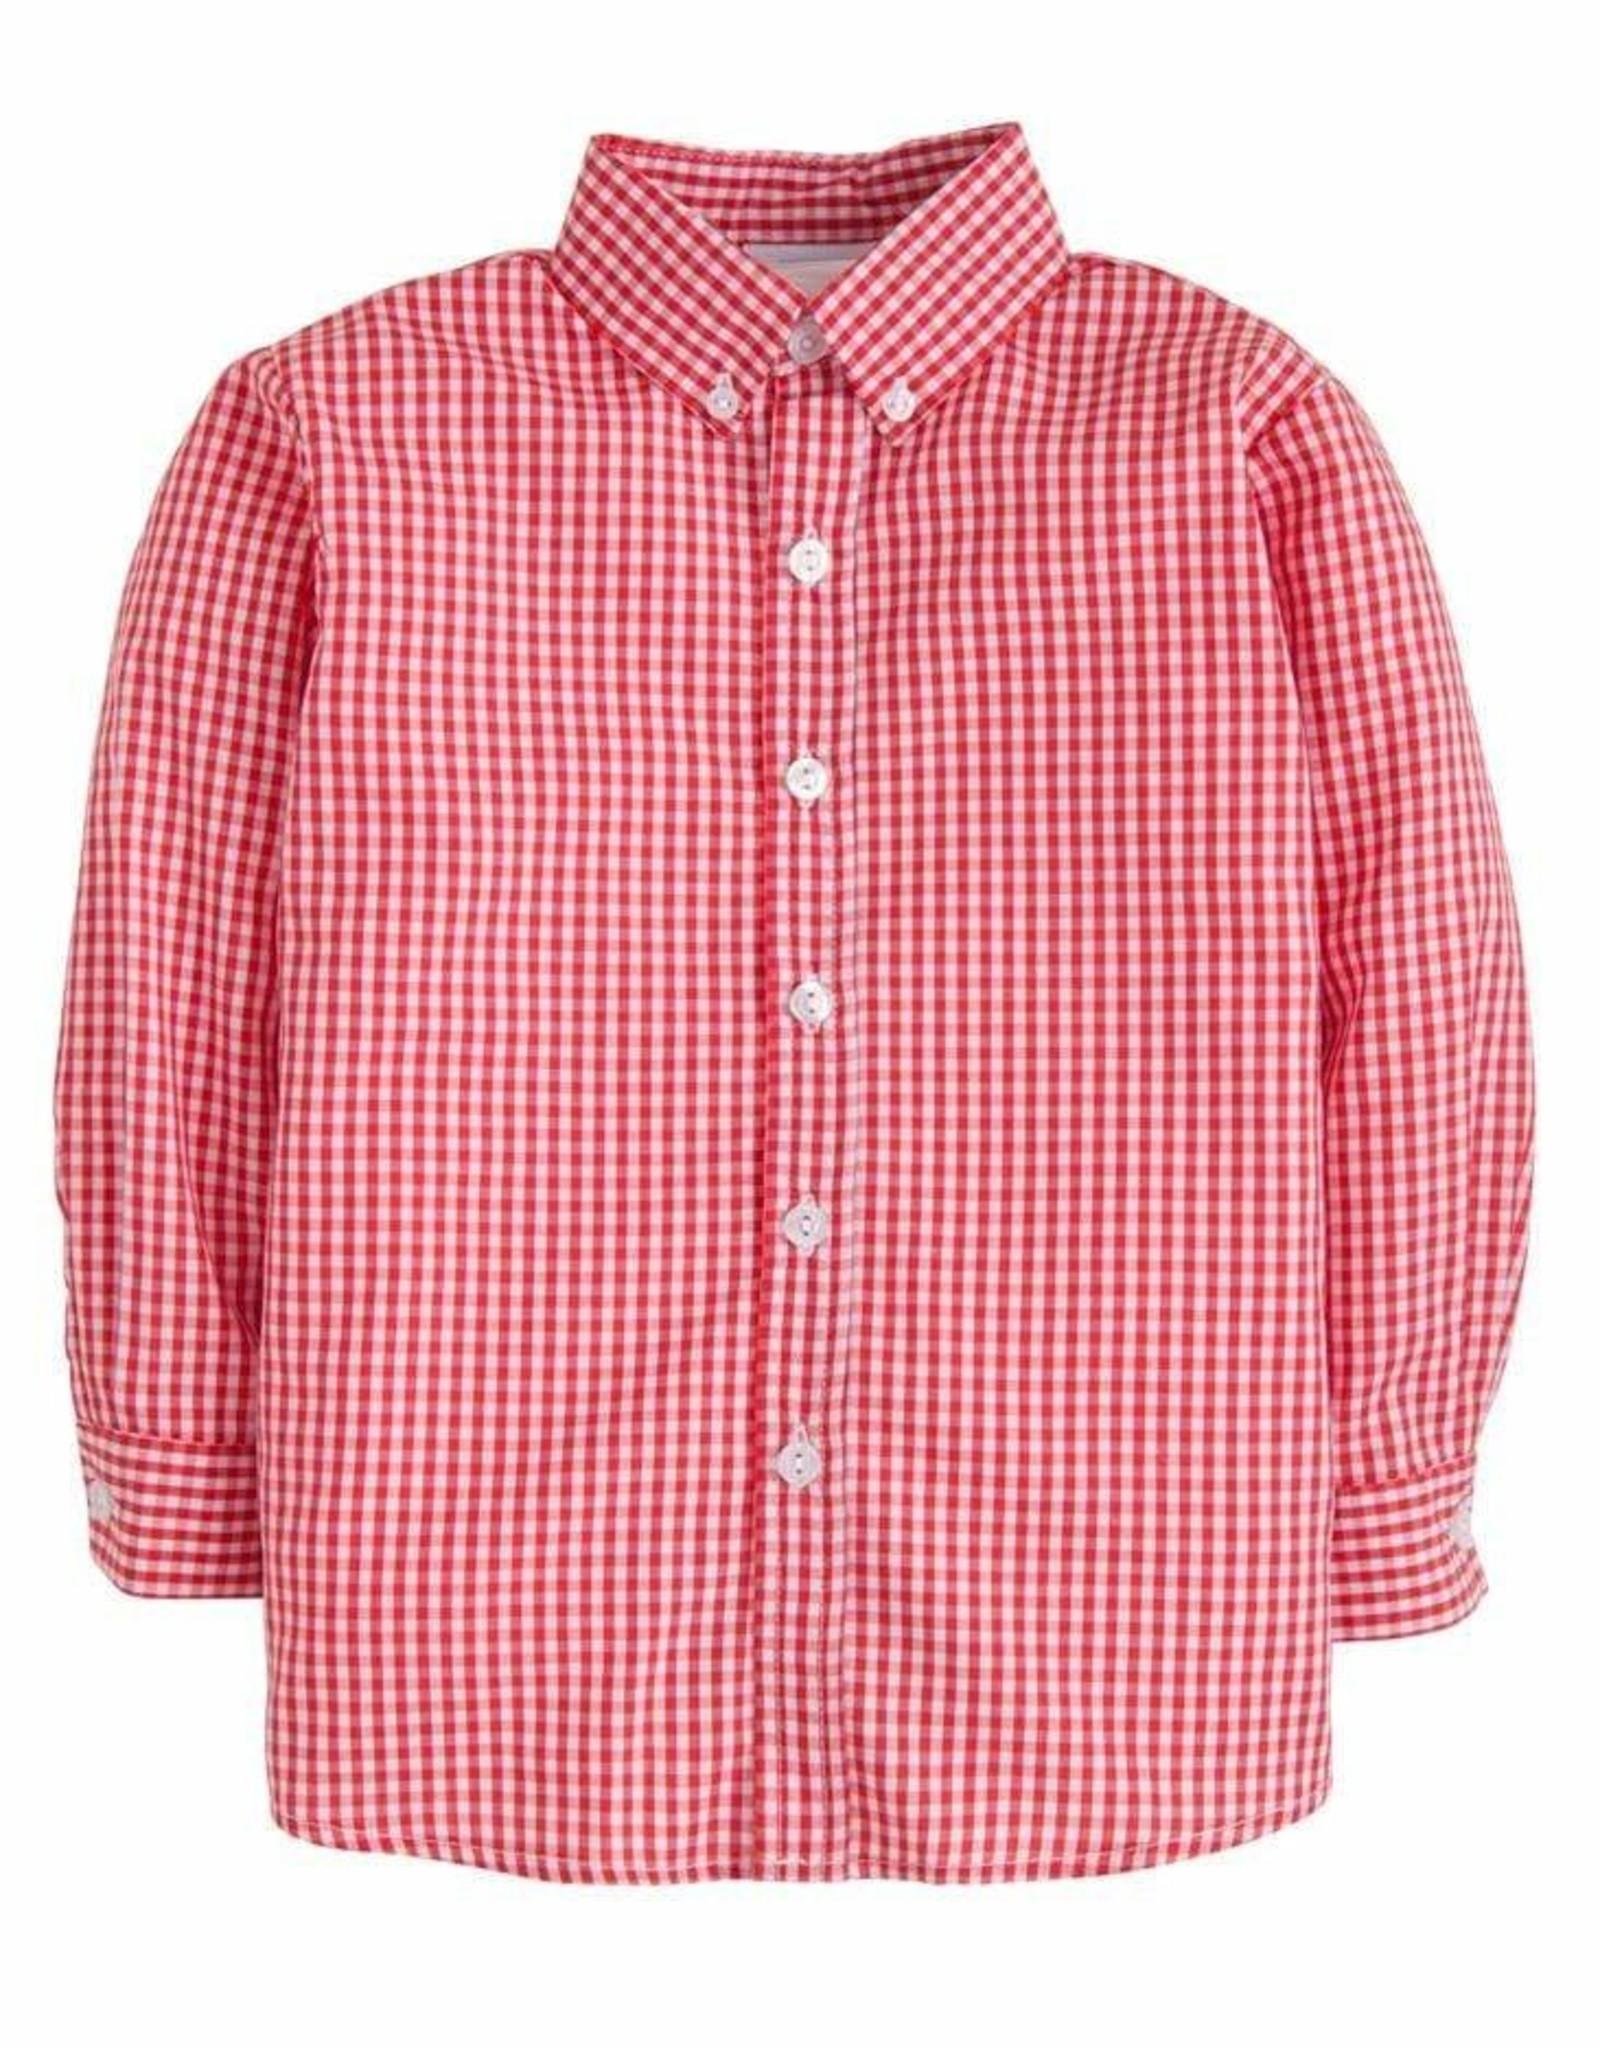 Little English Button Down Shirt